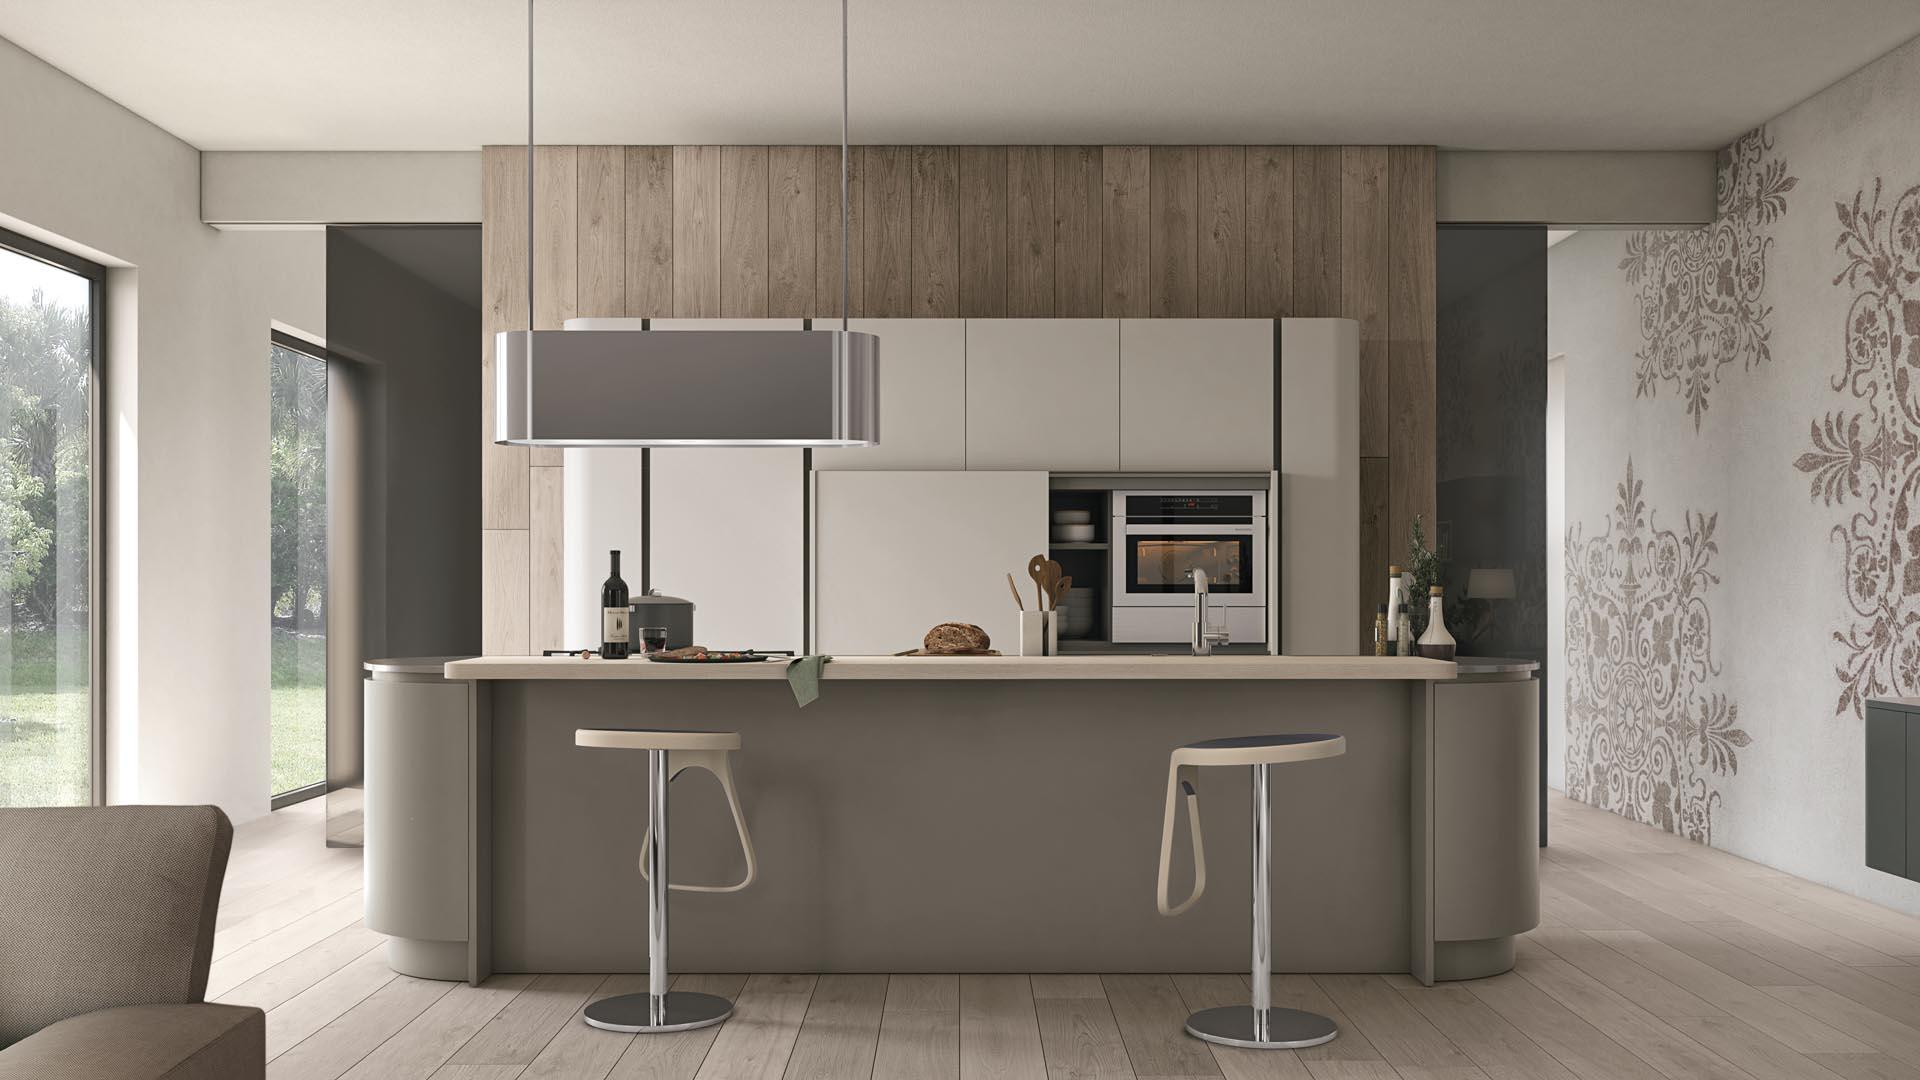 Colori per la cucina tonalit per tutti i gusti with pittura per cucina colori - Pitture lavabili per cucine ...